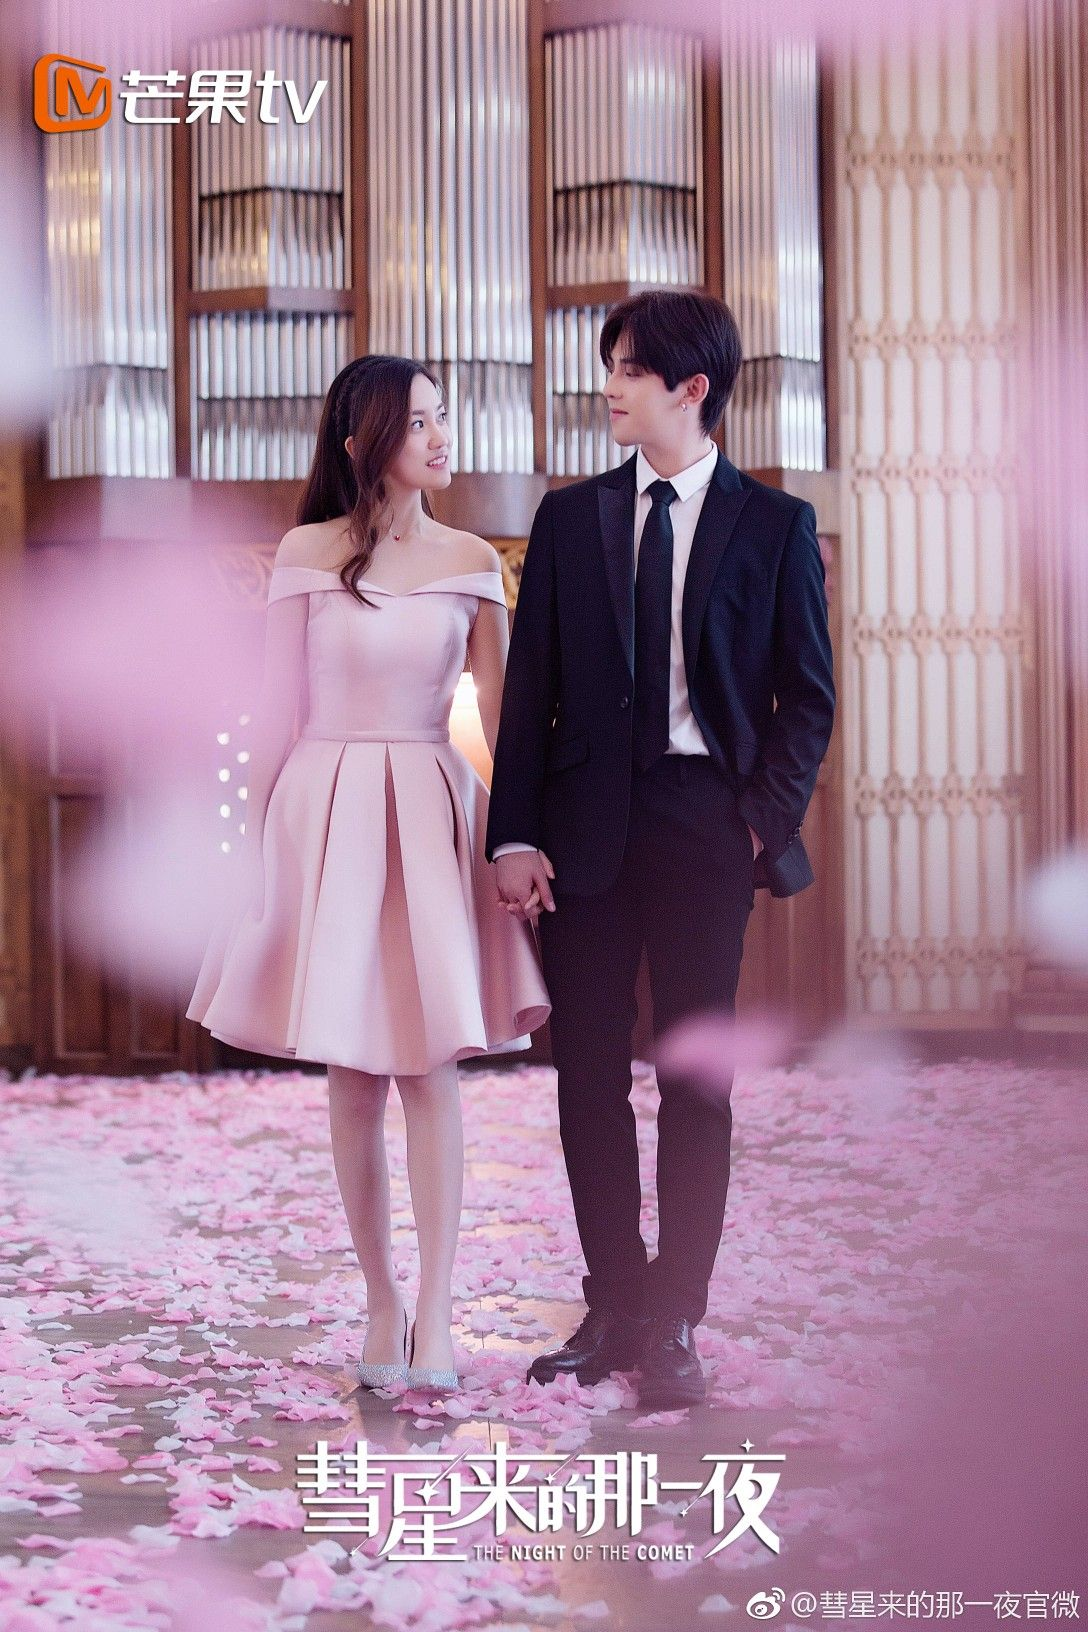 The Night Of The Comet Popular Korean Drama New Korean Drama Korean Drama Movies